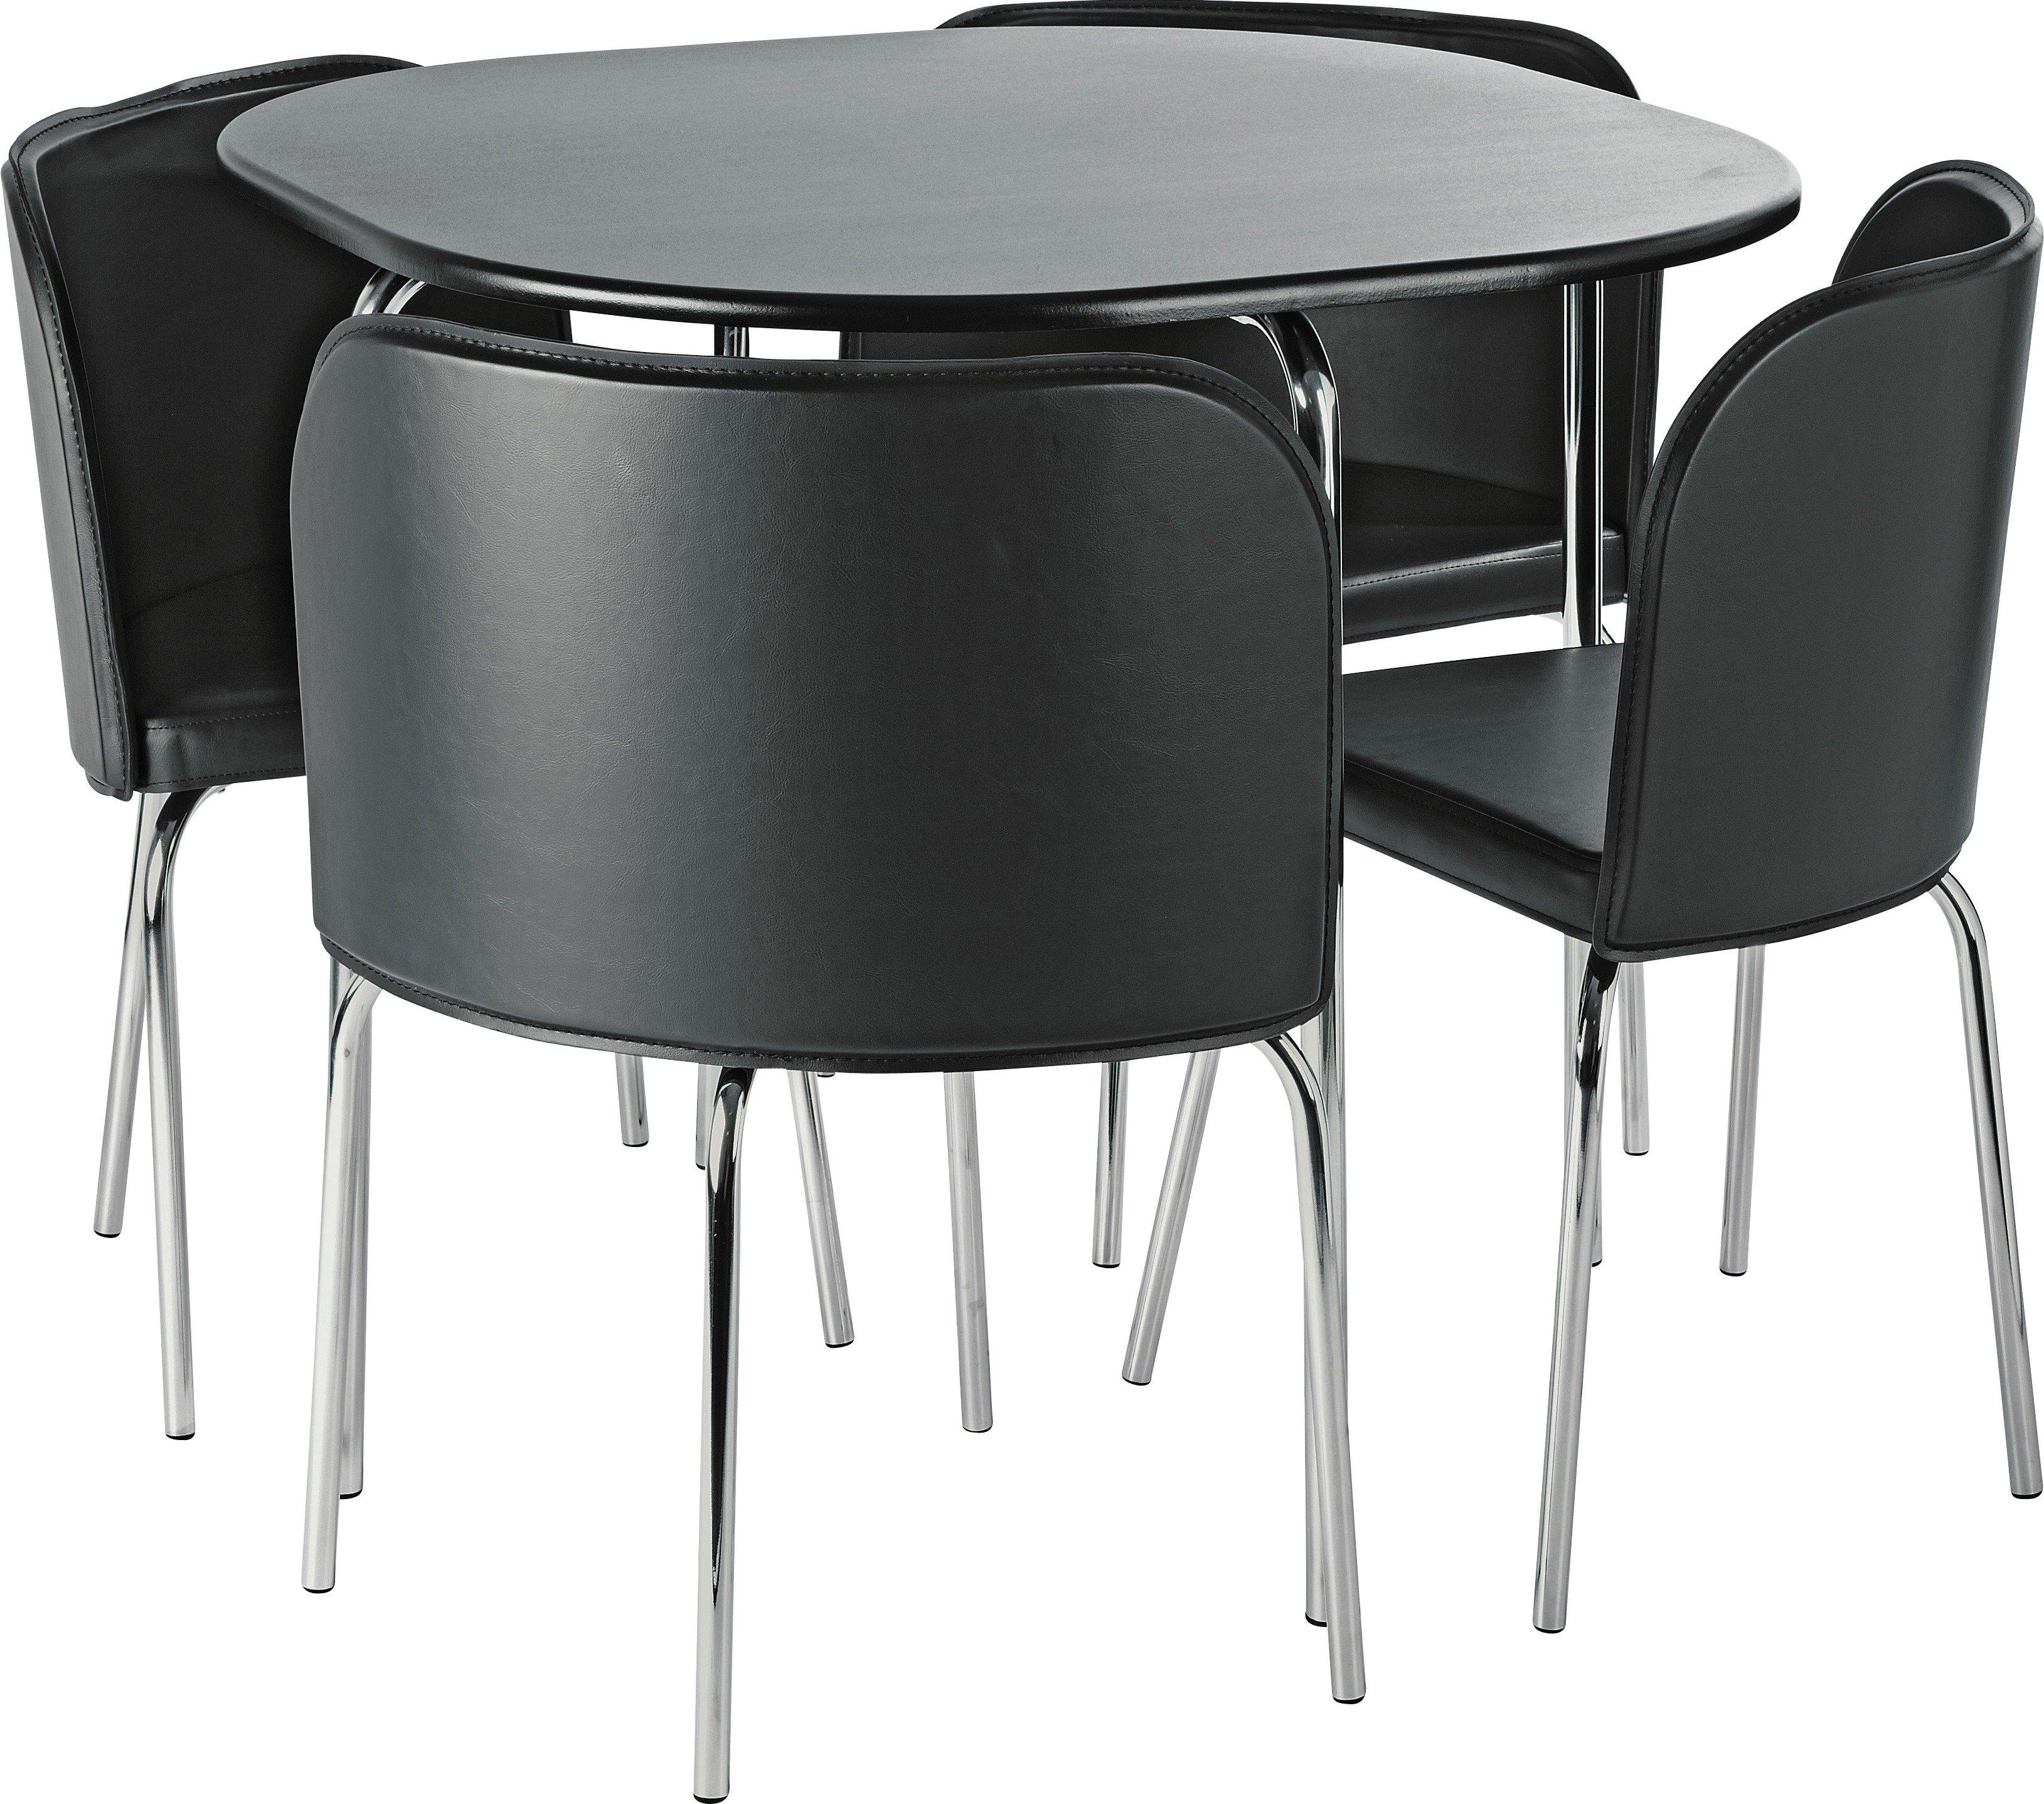 dining room sets black friday deals. hygena amparo dining table \u0026 4 chairs - black room sets friday deals o